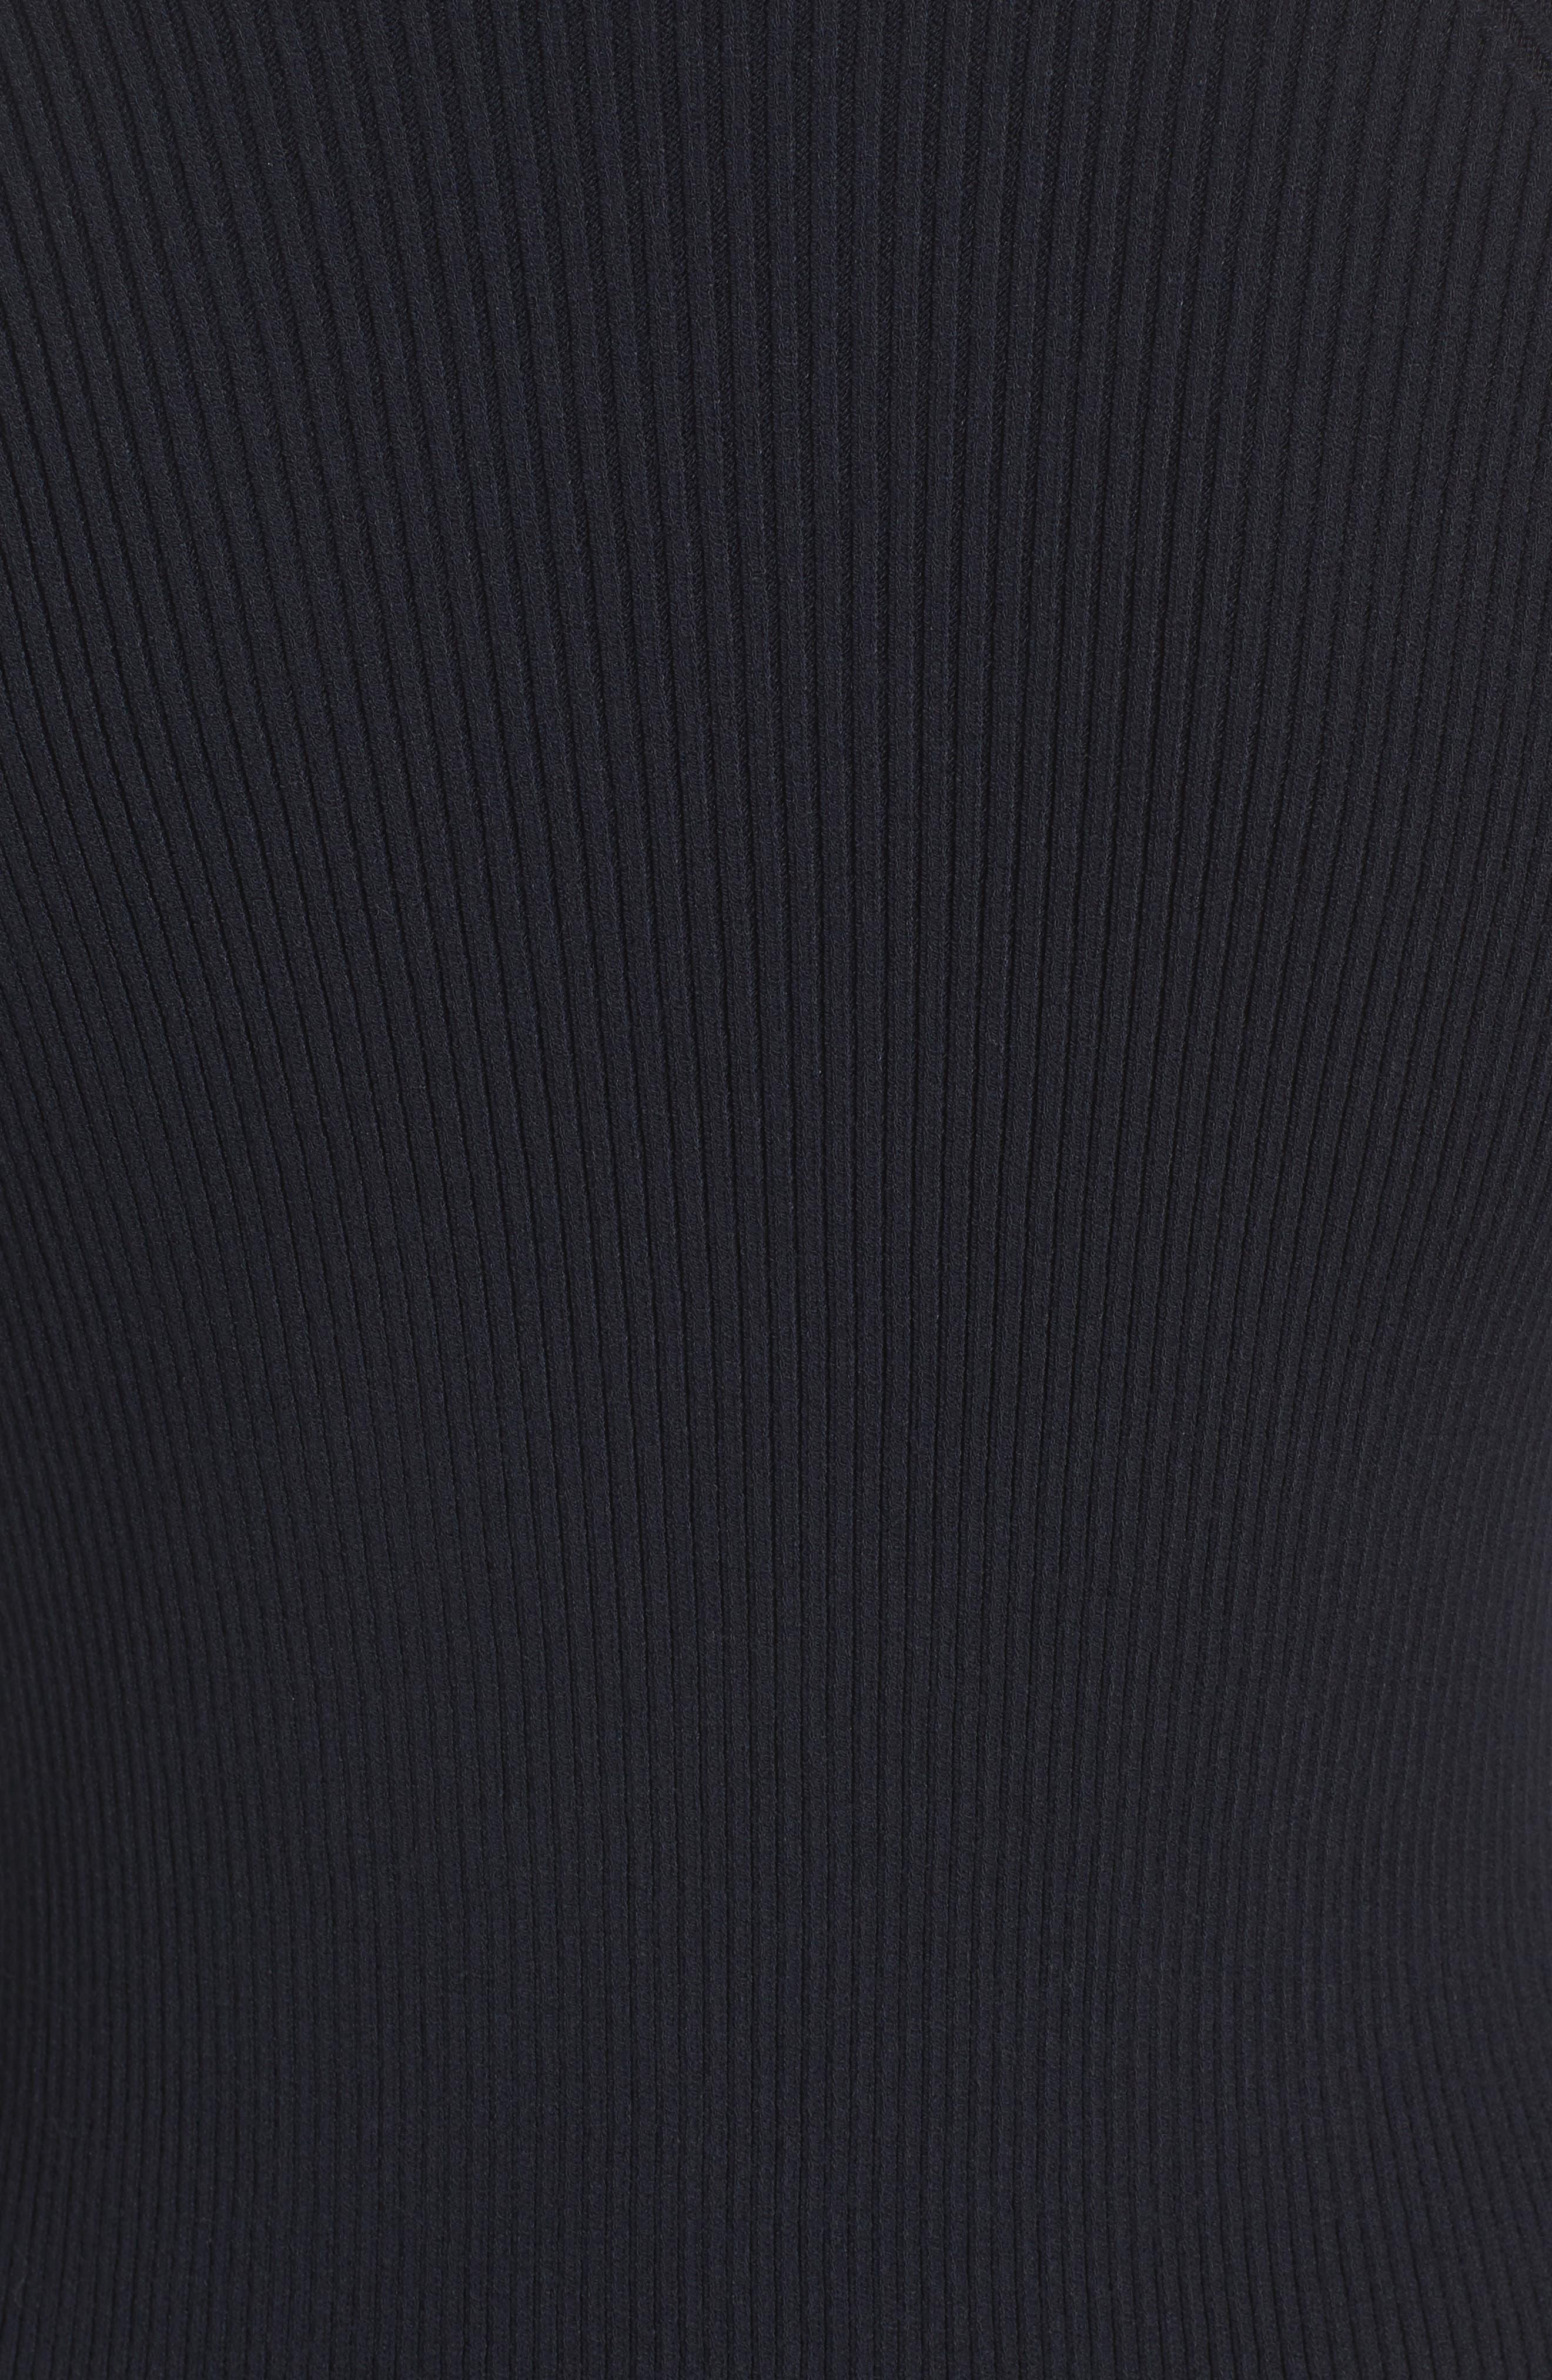 Farengi Sweater Dress,                             Alternate thumbnail 5, color,                             480